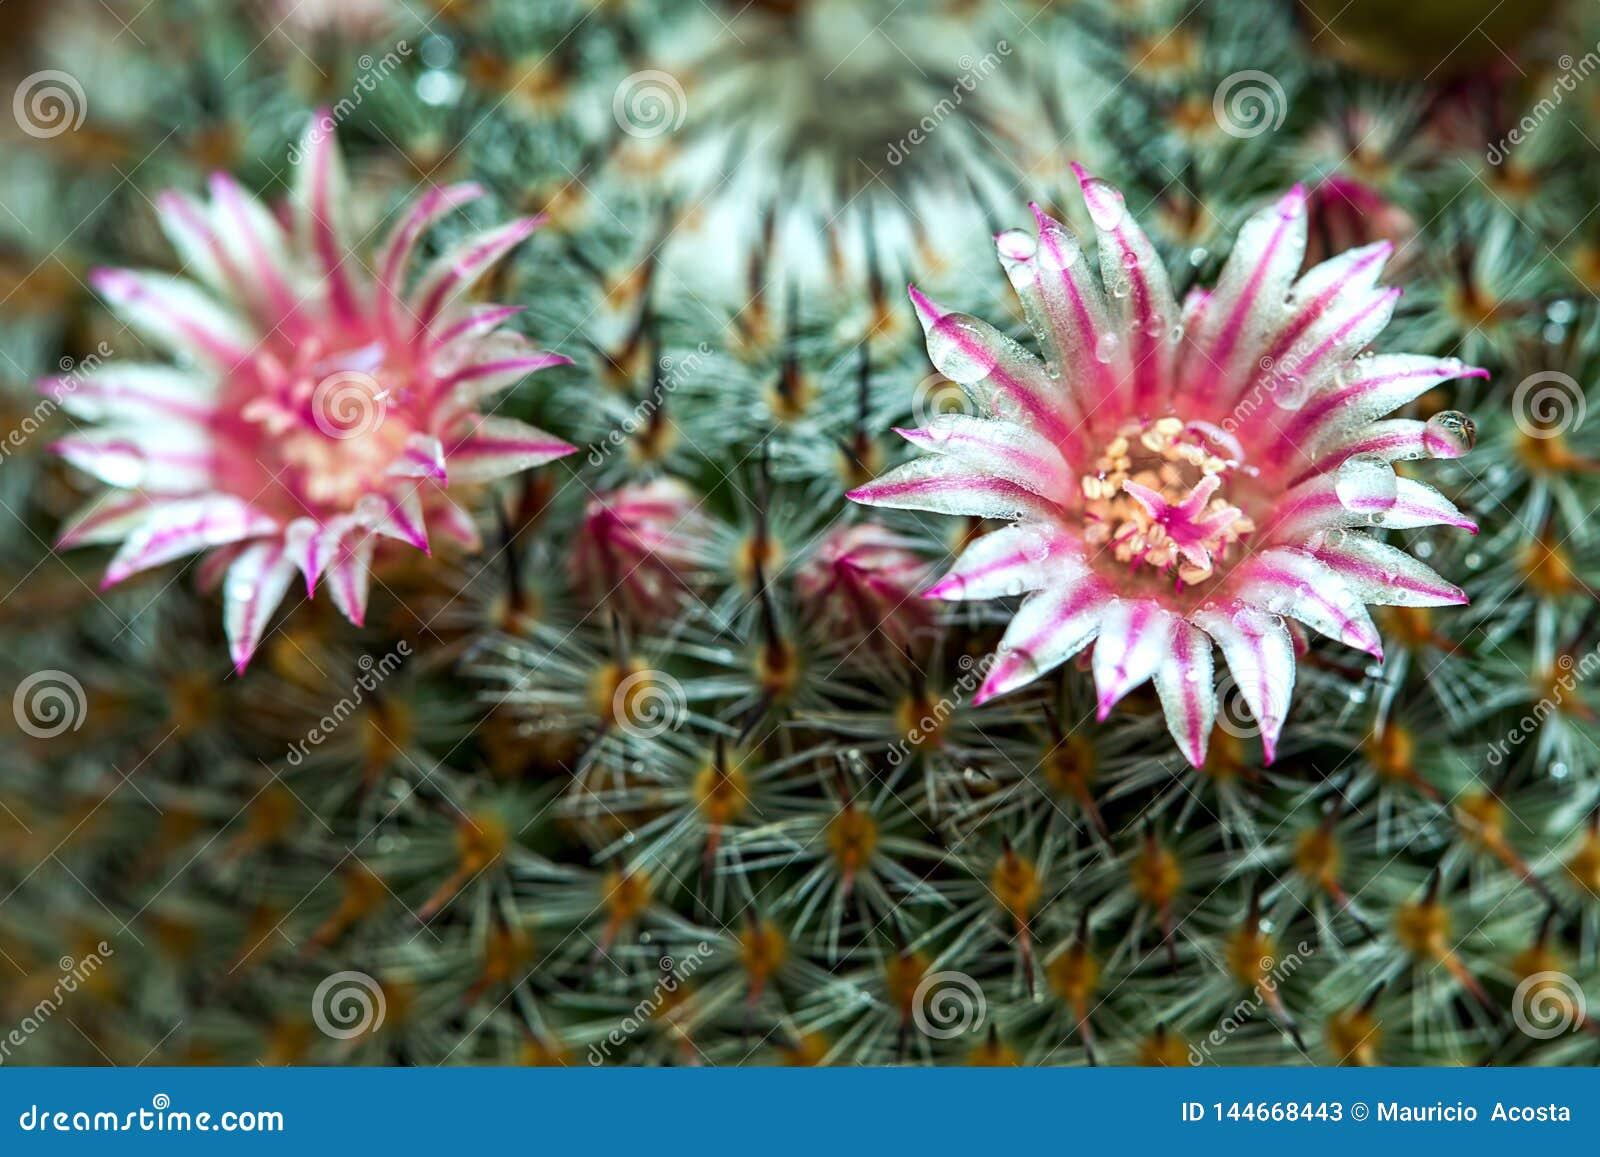 Mammillaria cactus flower with dew